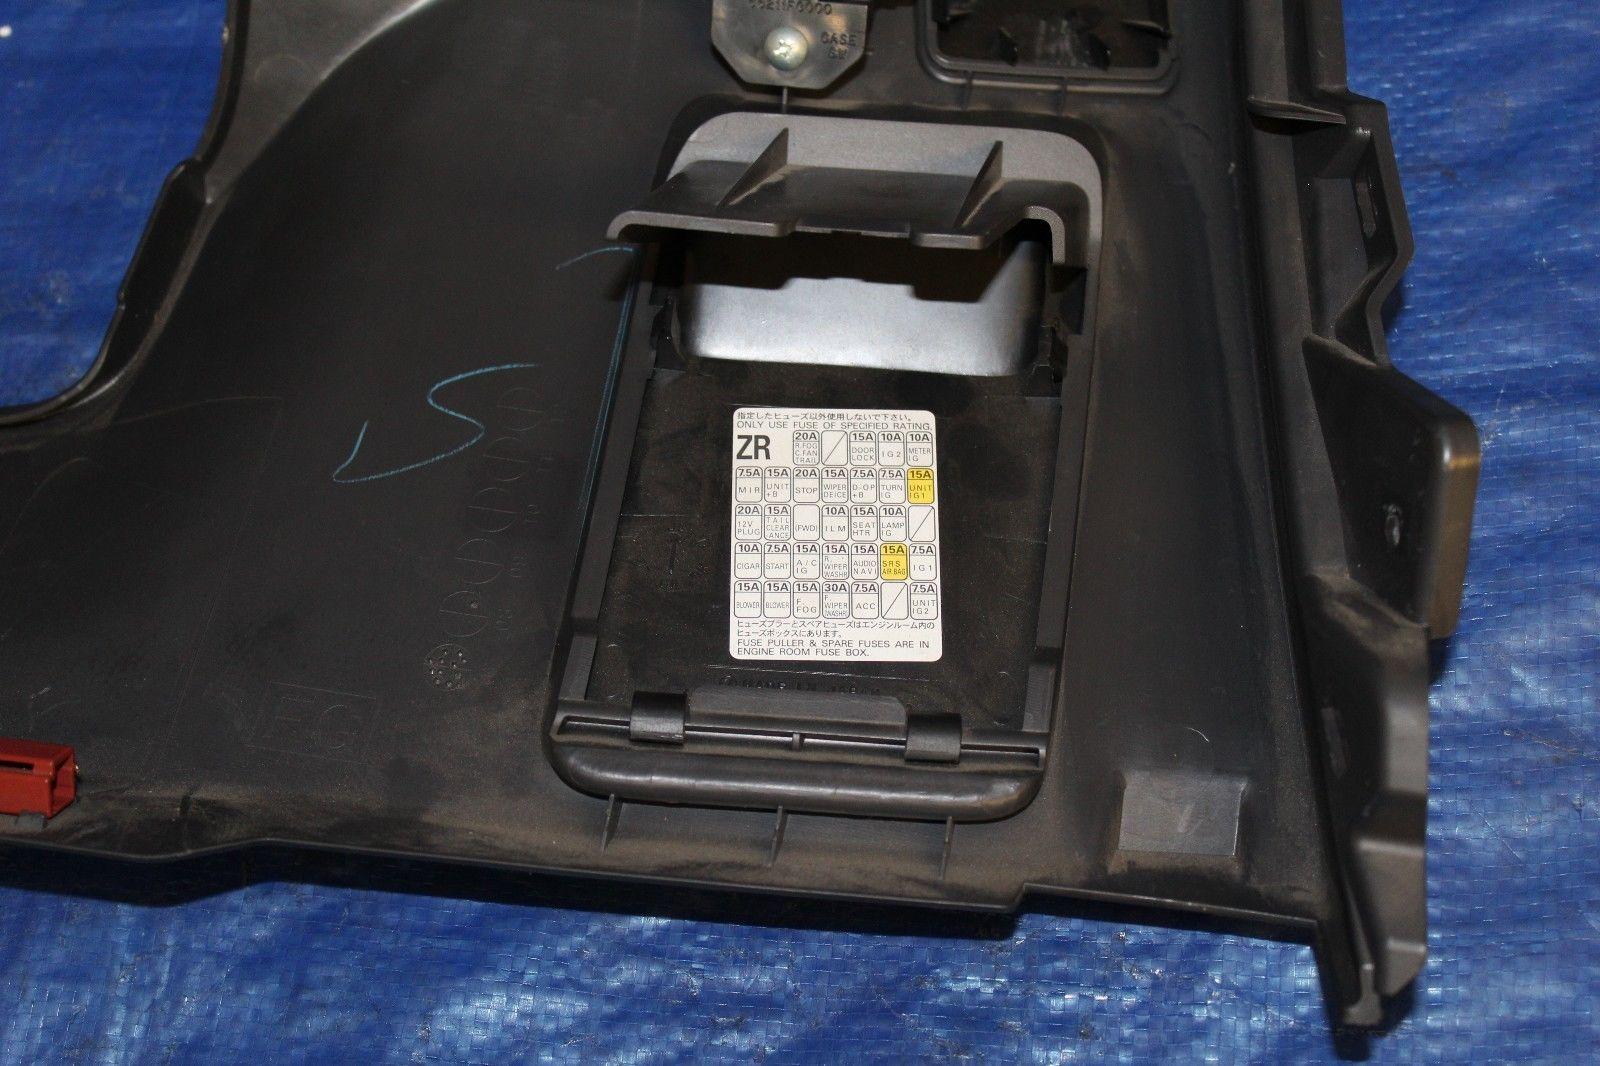 2008 2014 Subaru Impreza Wrx Sti Kick Panel Lh Lower Dash Mirror 2013 Fuse Box Headlight Level Switch